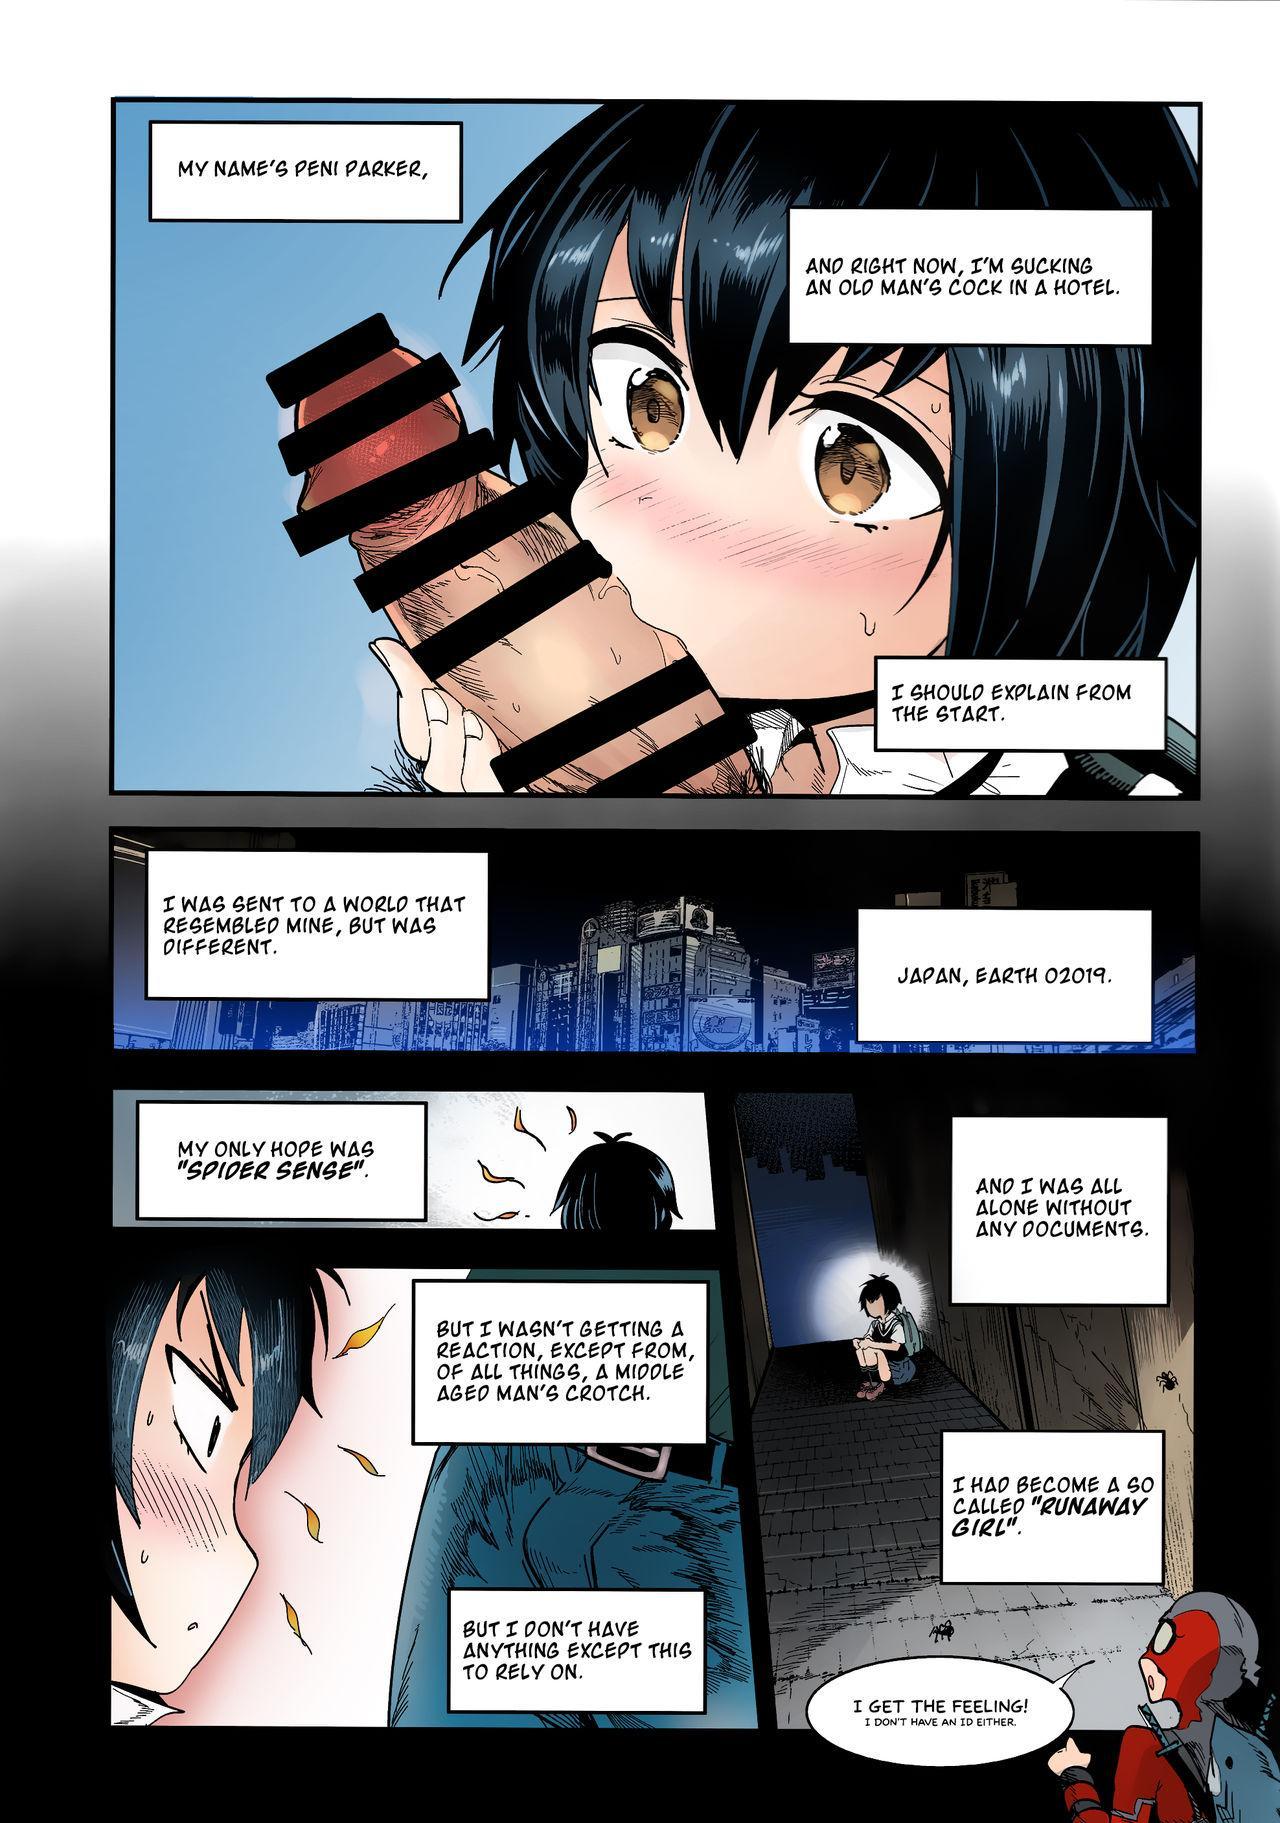 Peni Parker no Usui Hon ni wa Ooinaru Sekinin ga Tomonau   Peni Parker's Thin Book Comes with great Responsibility 5